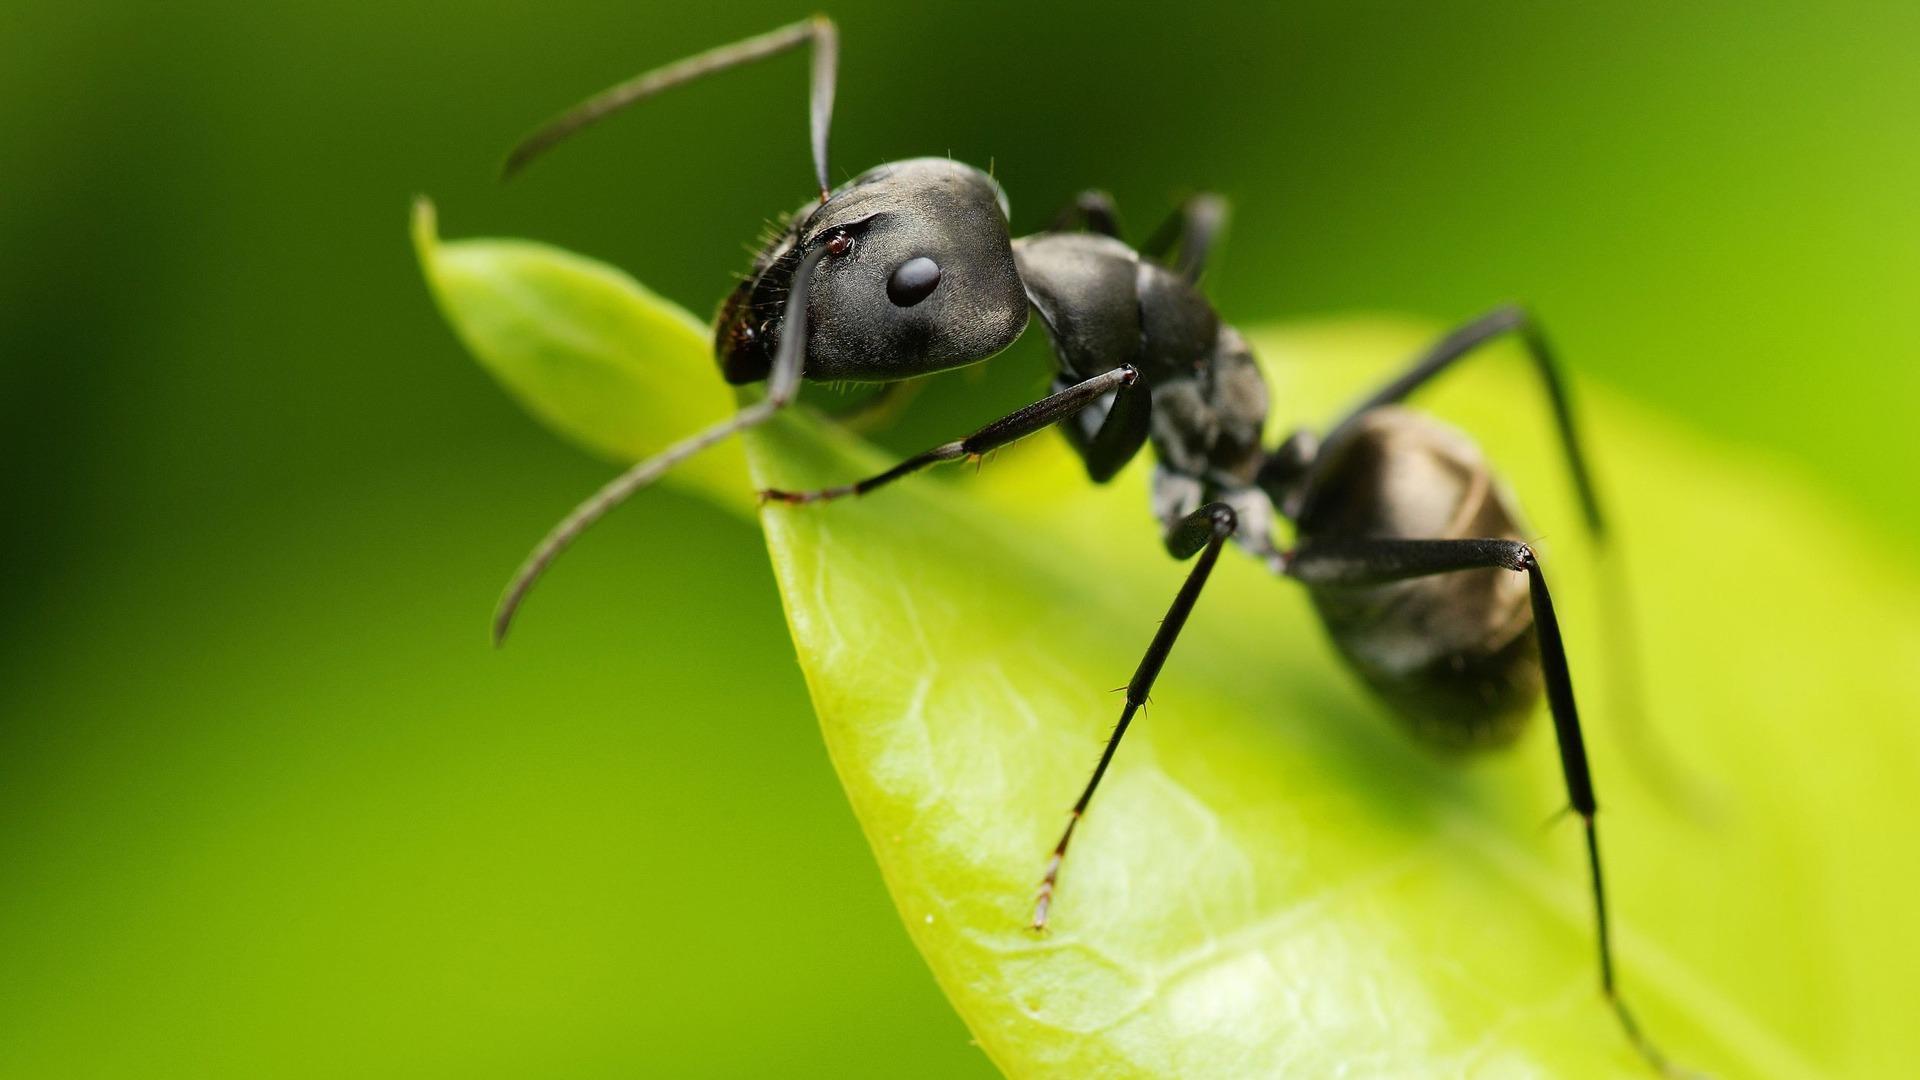 Photo of (GPS) طبيعي في النمل.. يعرف المواقع ويُحدّد الاتجاهات. إقرأ